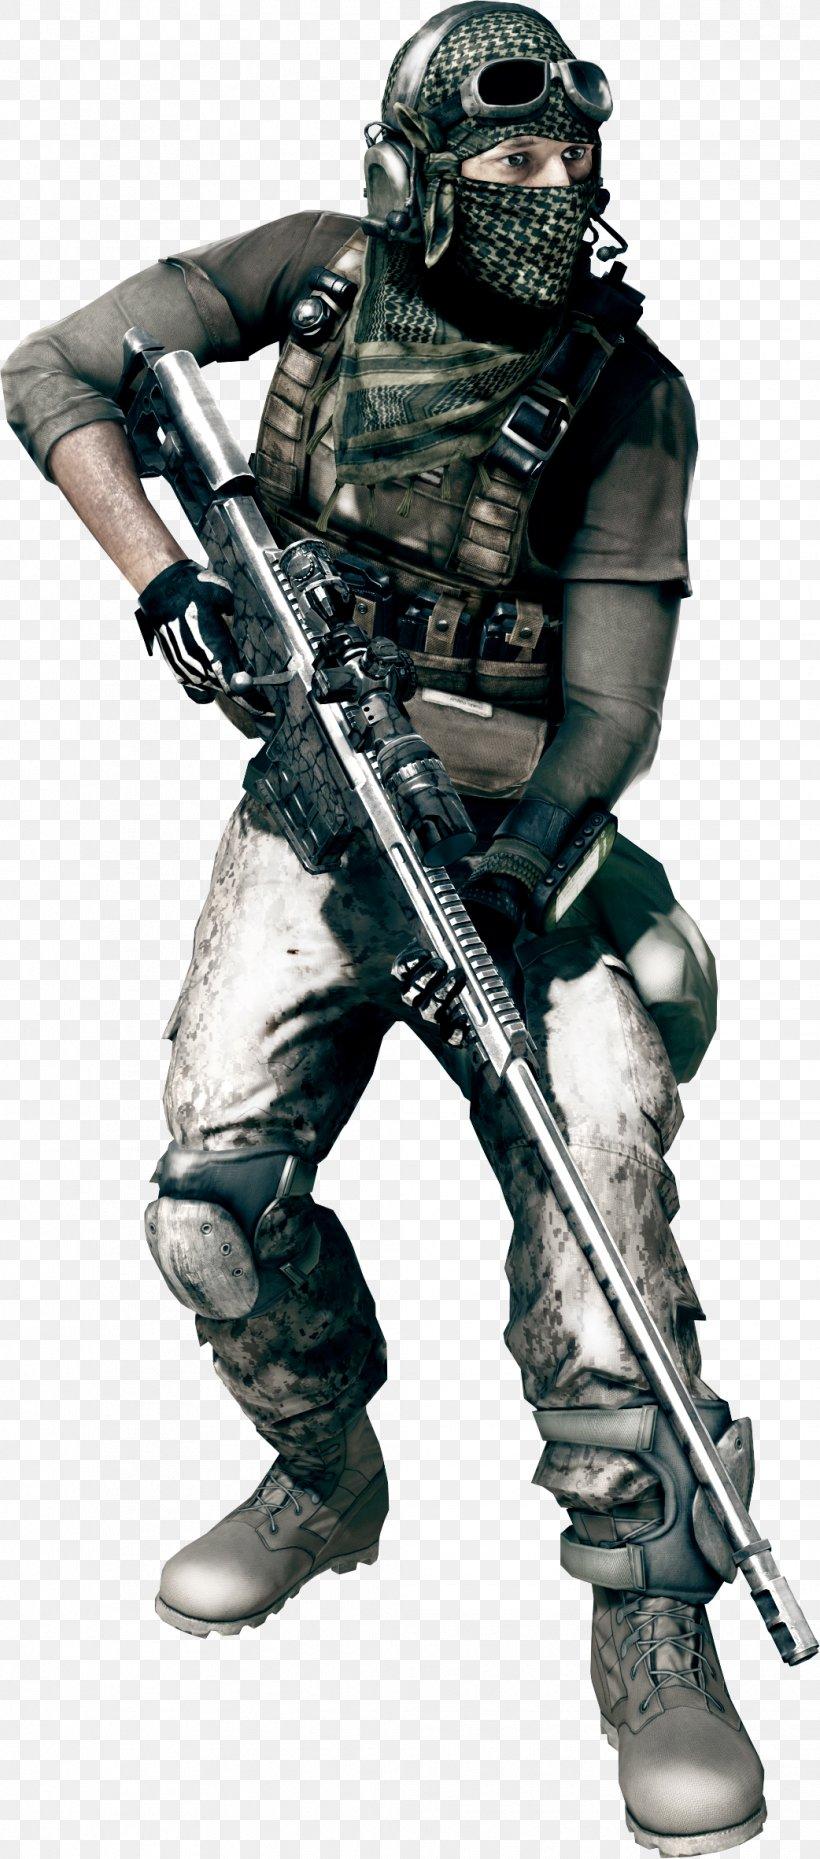 Battlefield 3 Battlefield 2 Battlefield 4 Battlefield 1 Battlefield: Bad Company 2, PNG, 1042x2363px, Battlefield 3, Armour, Battlefield, Battlefield 1, Battlefield 2 Download Free